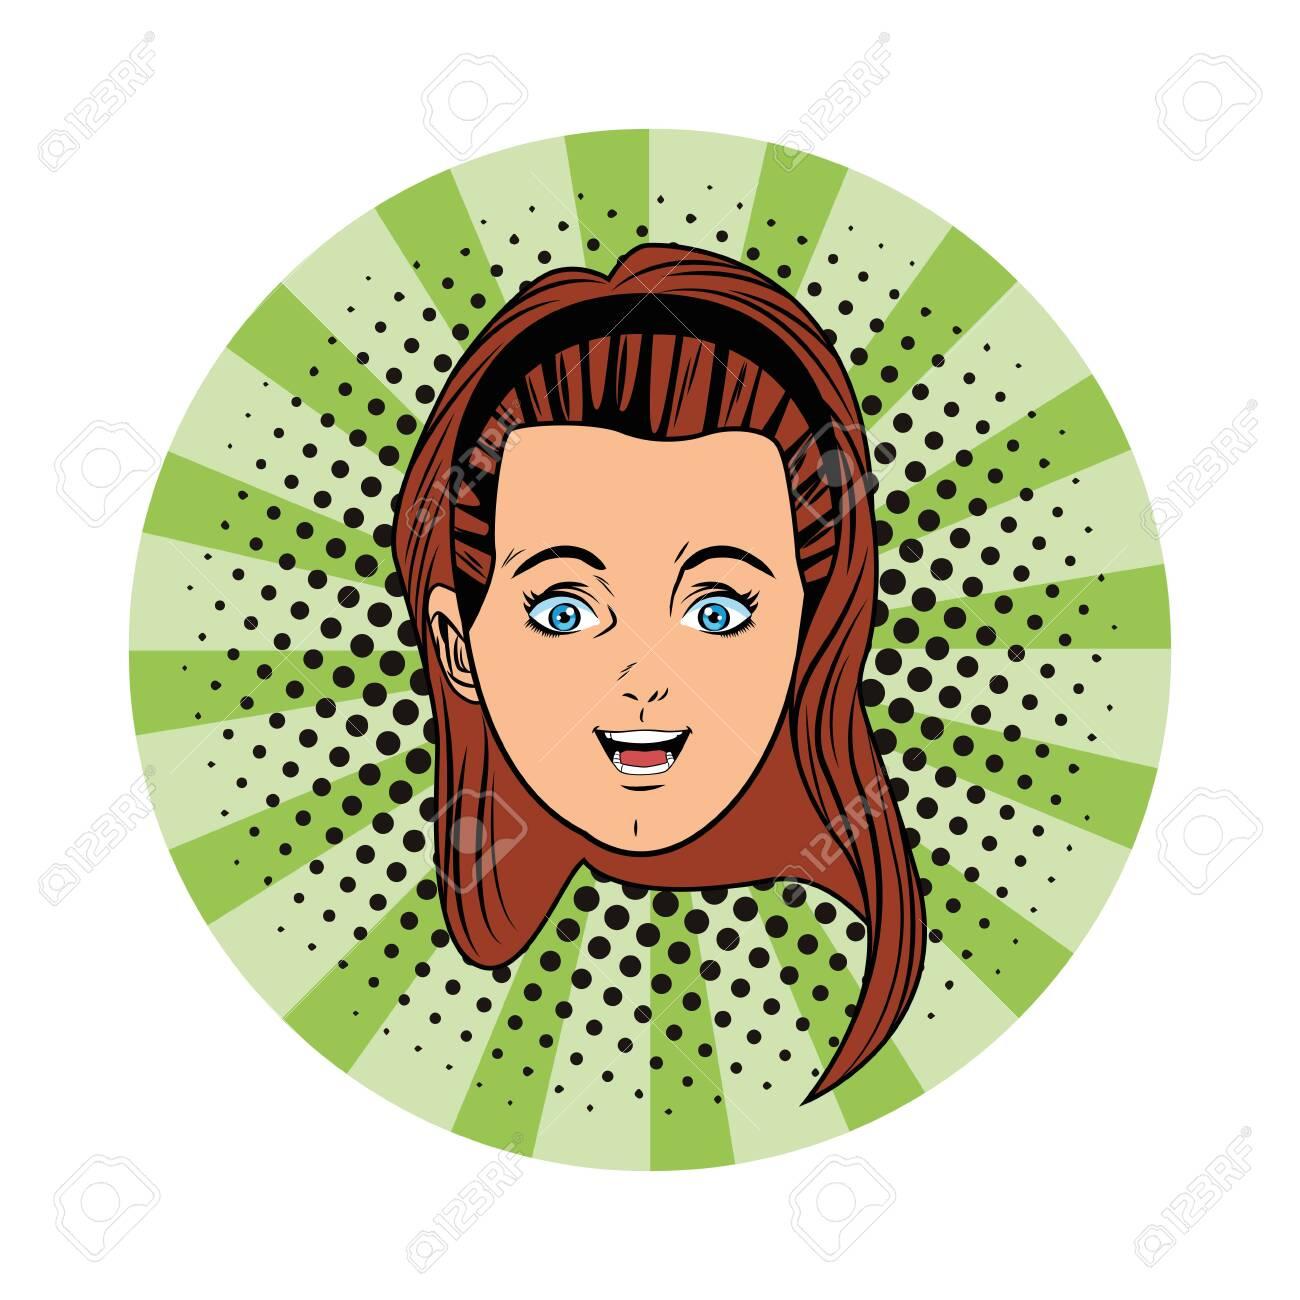 Young Girl Face Wearing Bandana Avatar Cartoon Character Portrait